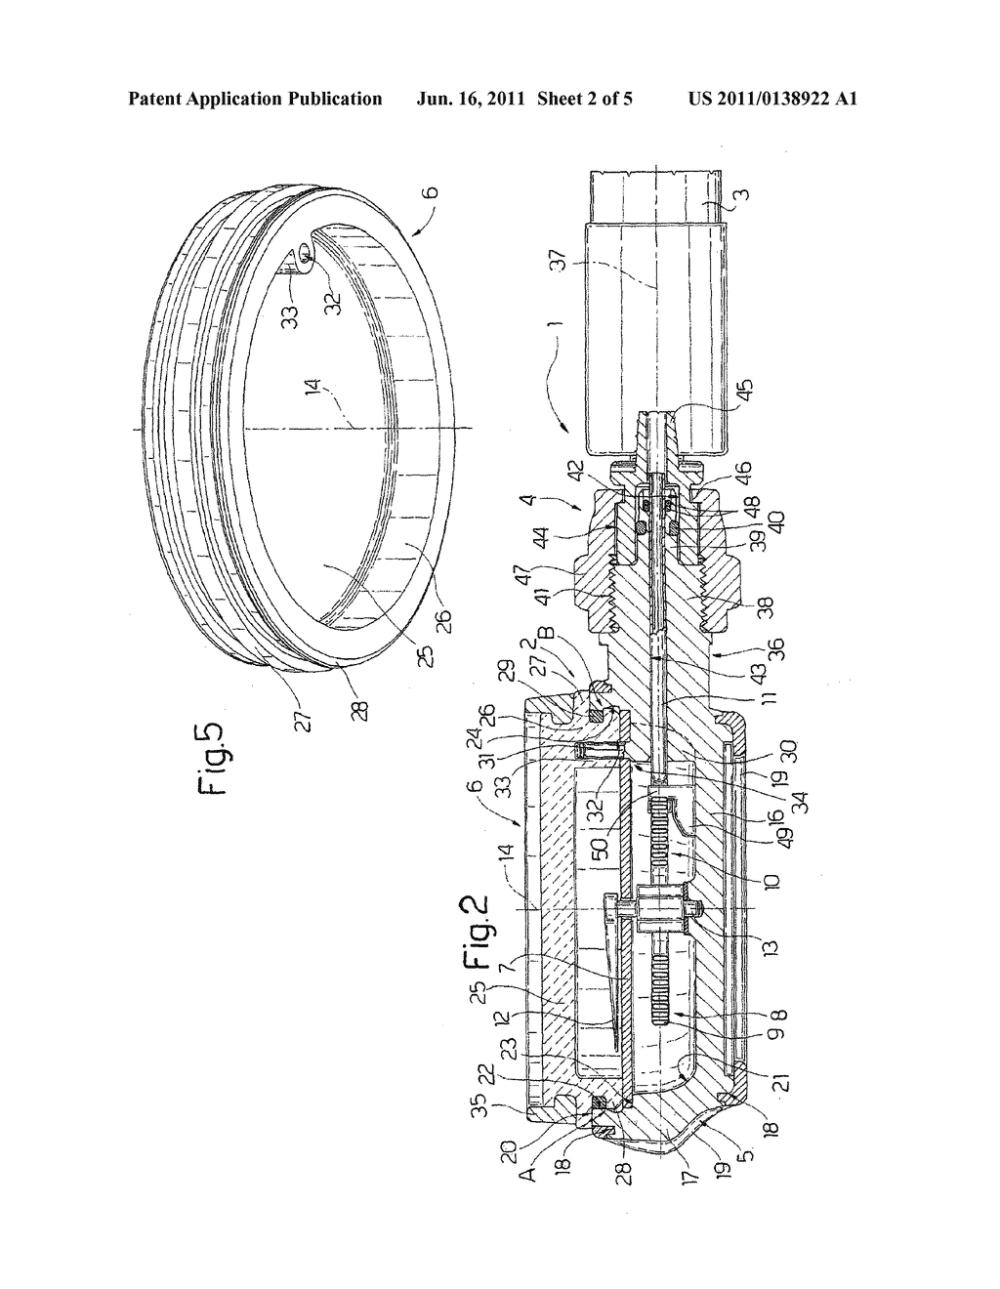 medium resolution of scuba diving air tank gauge diagram schematic and image 03 rh patentsencyclopedia com gas tank diagram septic tank wiring schematic